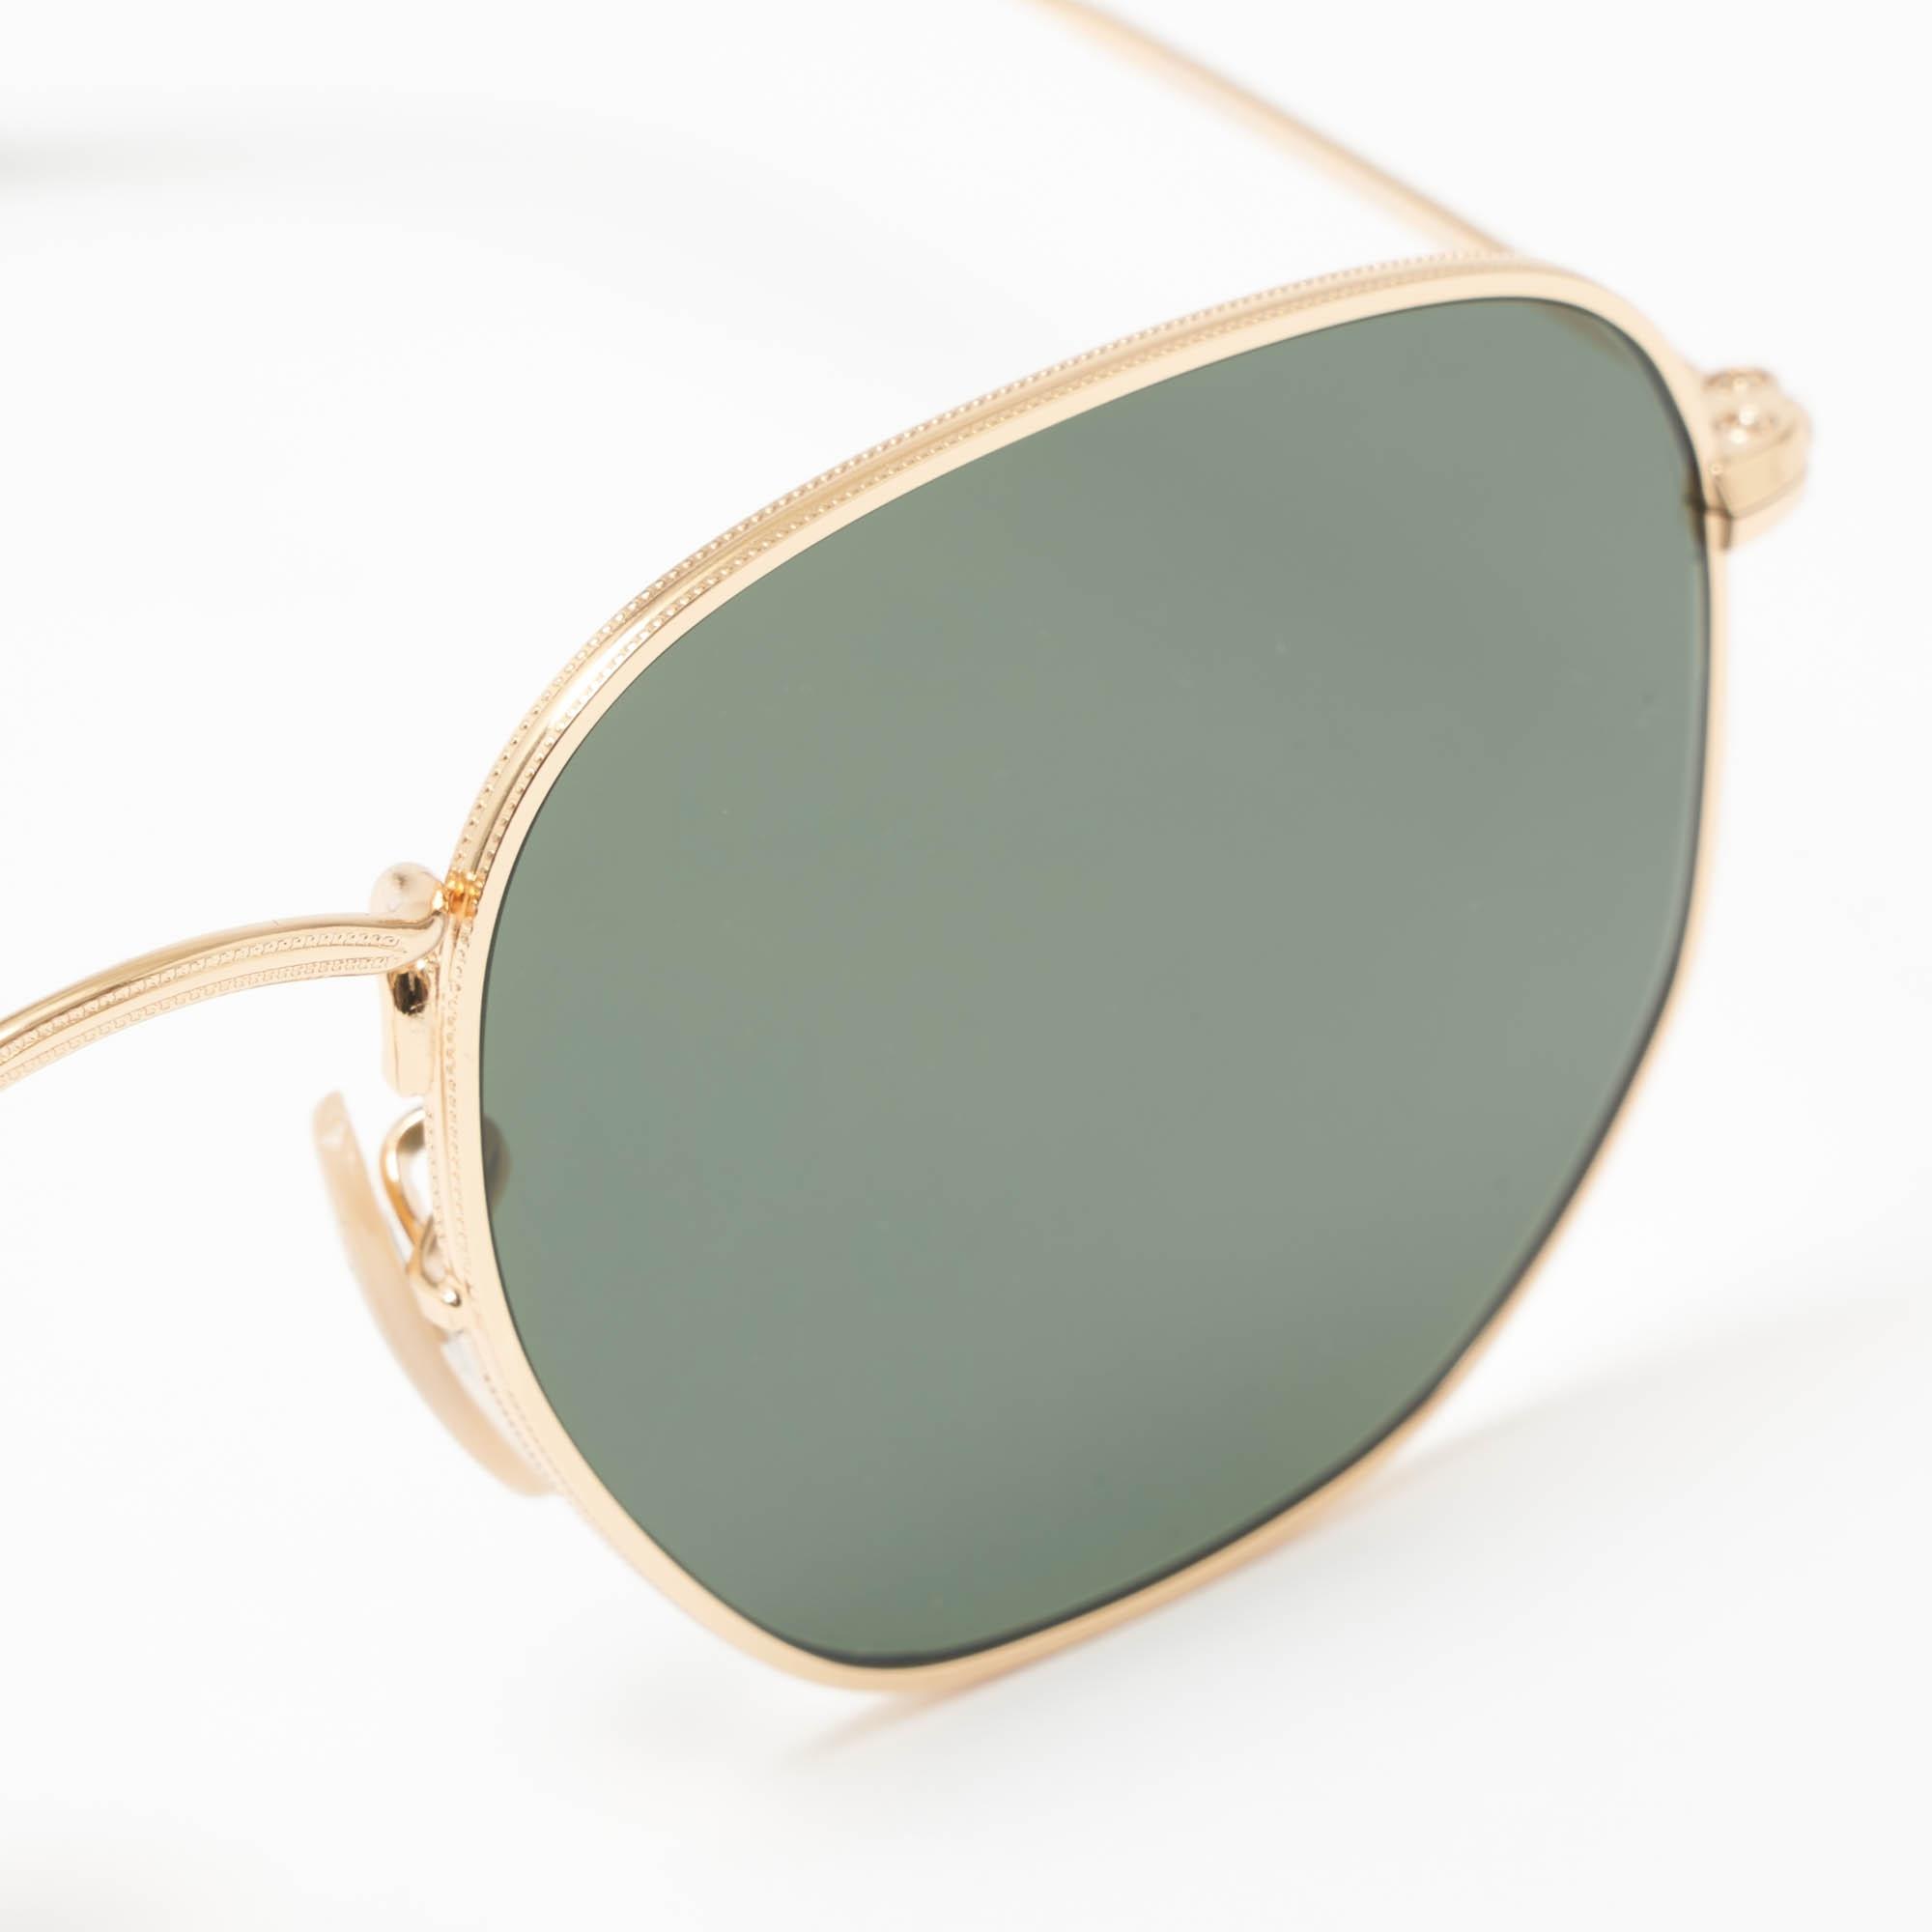 77dd4bd854a5f Gold Hexagonal Flat Lens Sunglasses - Green Classic G-15 Lenses